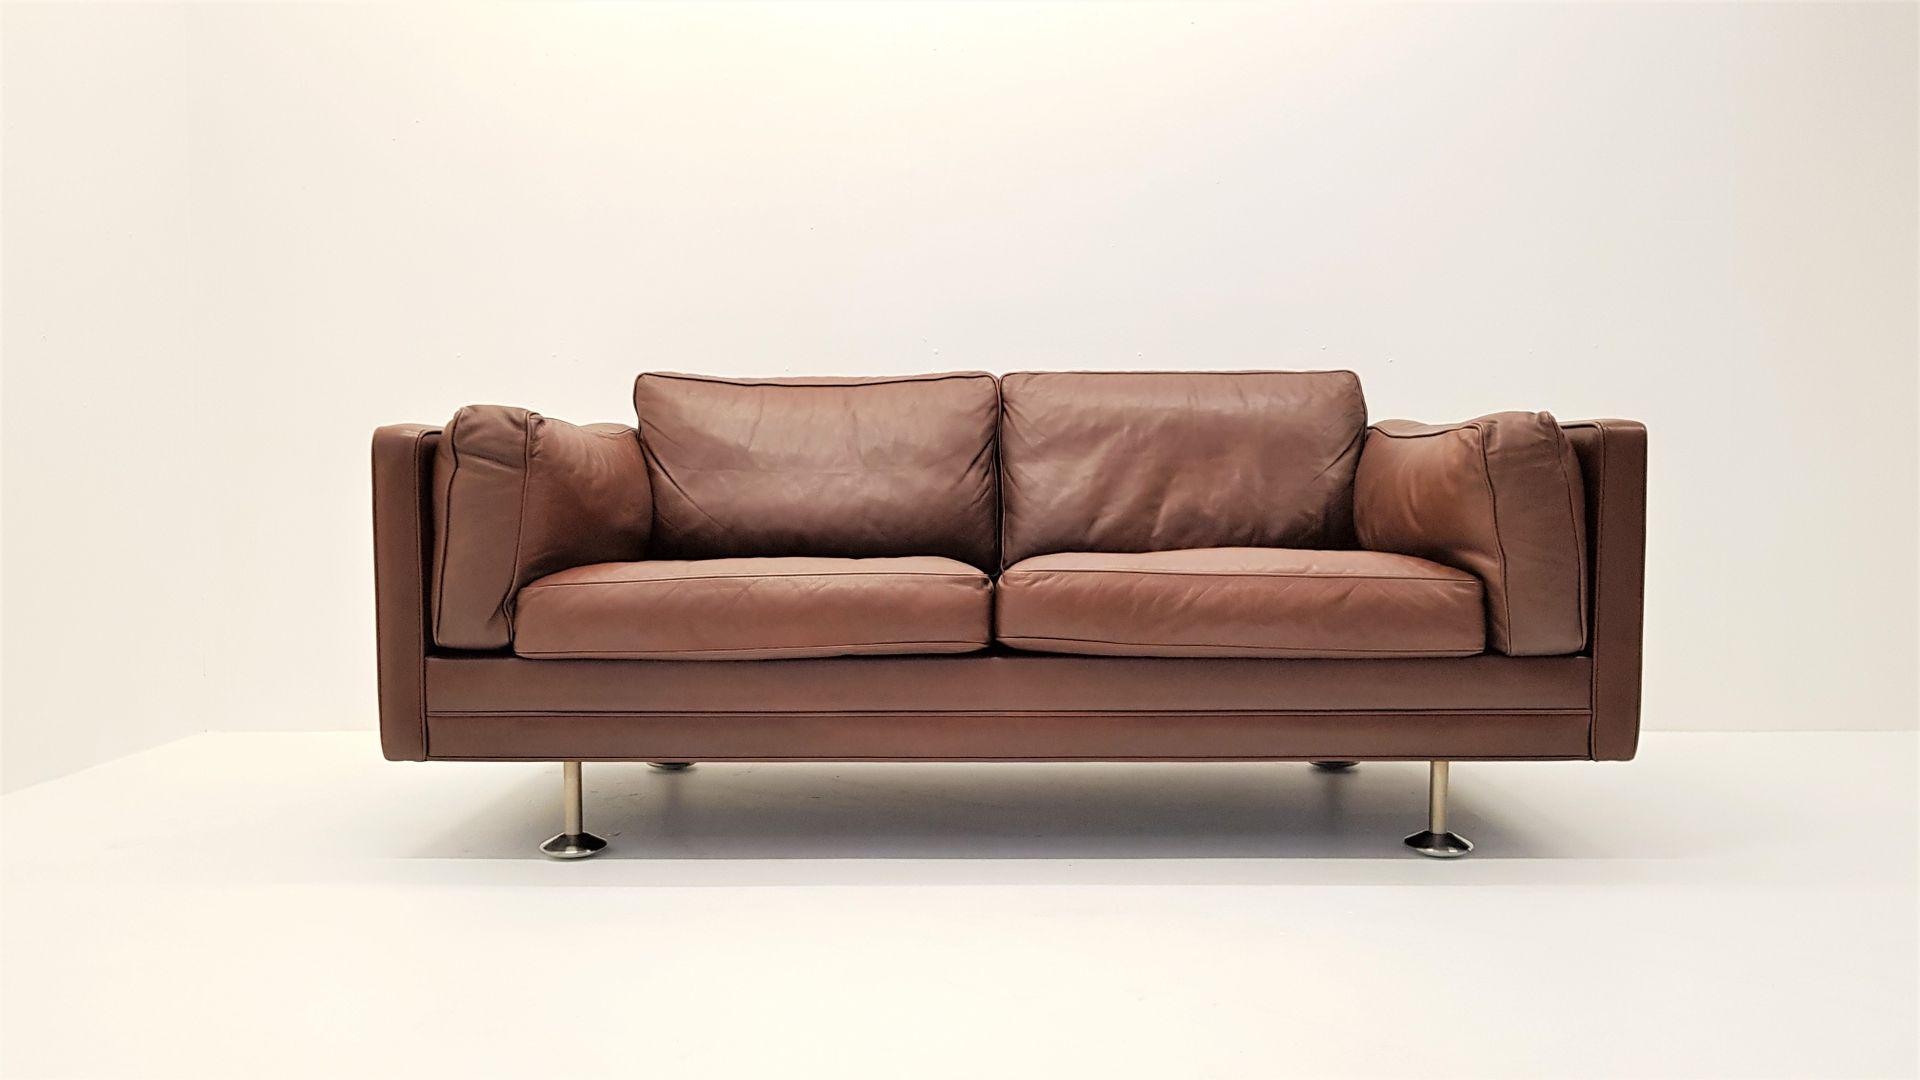 Top Ergebnis 50 Genial sofa 2 Sitzer Modern Foto 2018 Zat3 2017